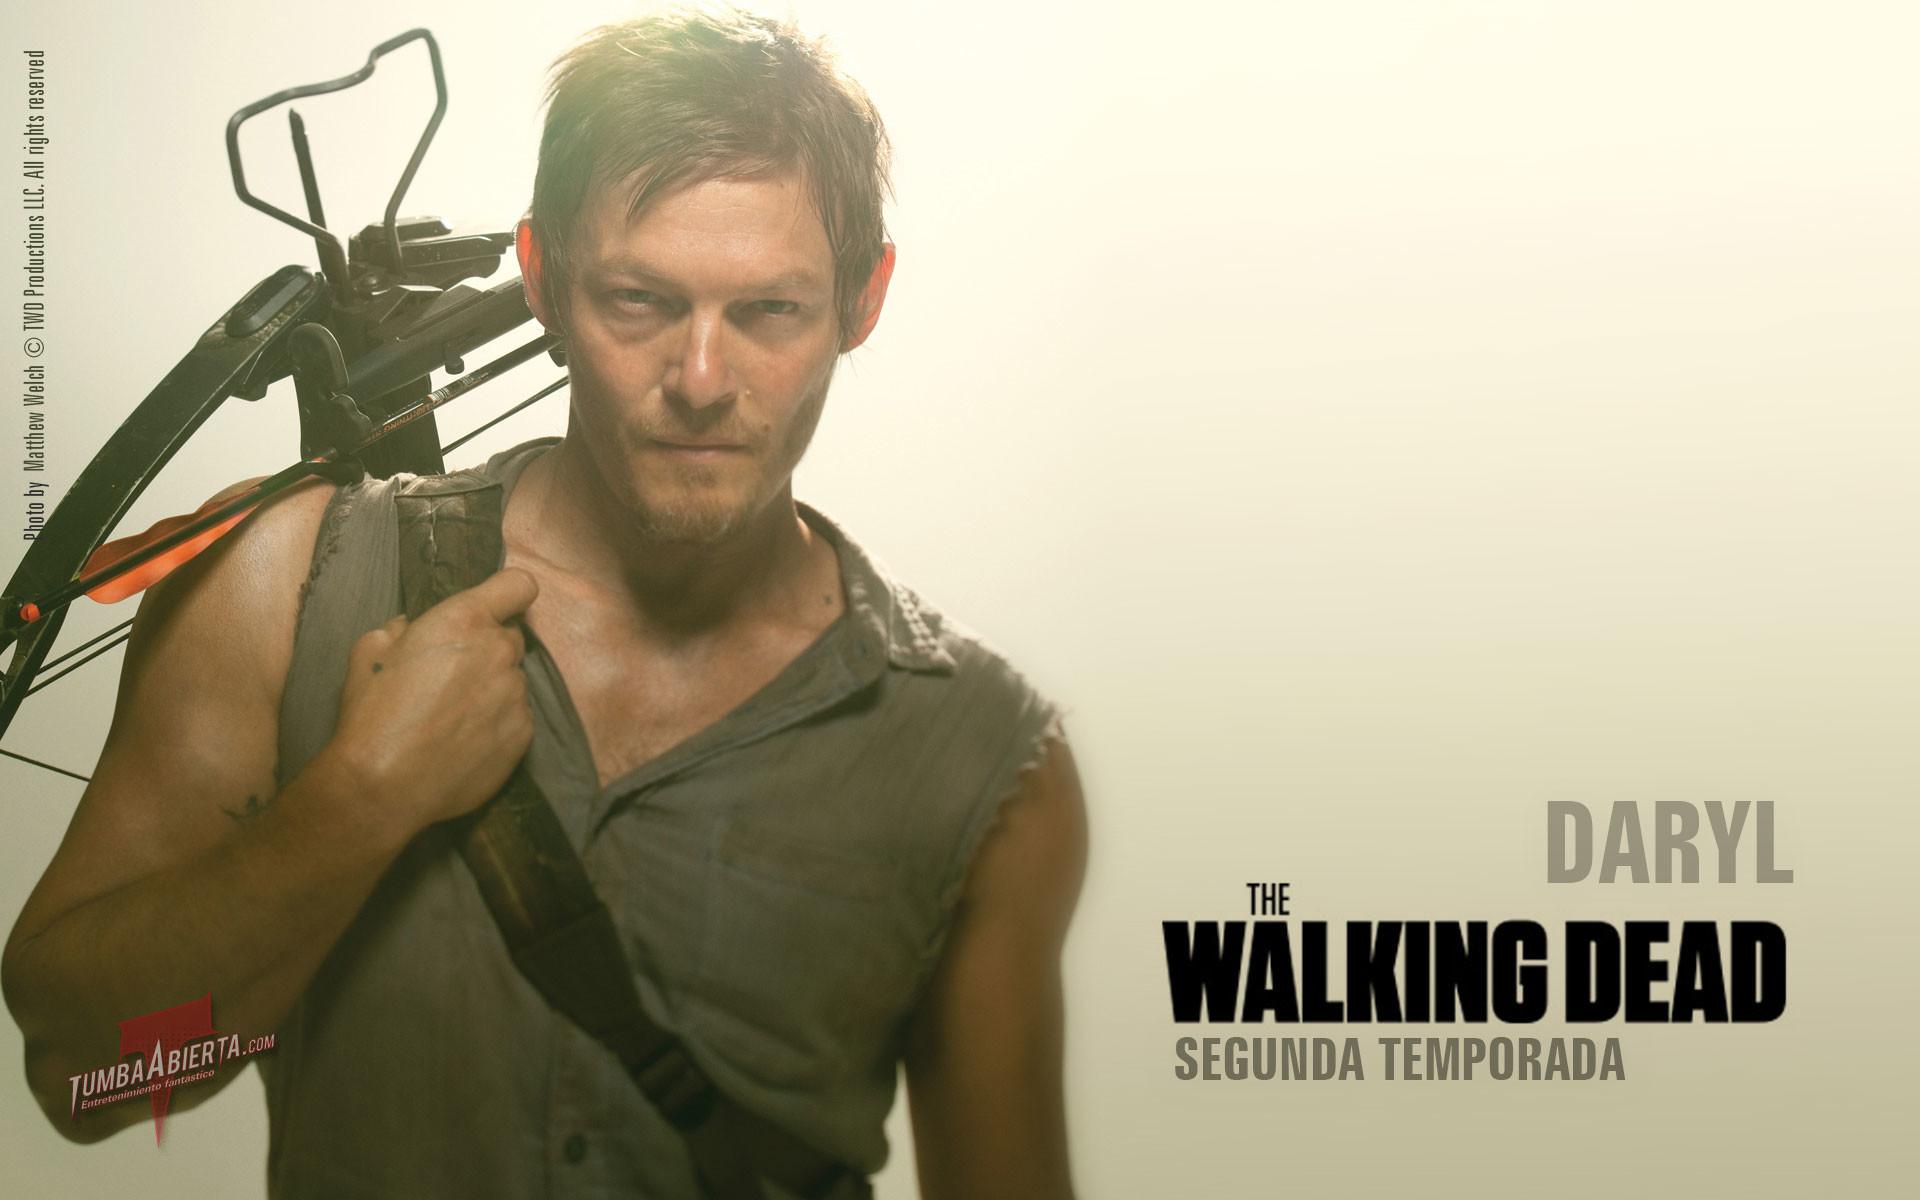 1920x1200 Daryl The Walking Dead